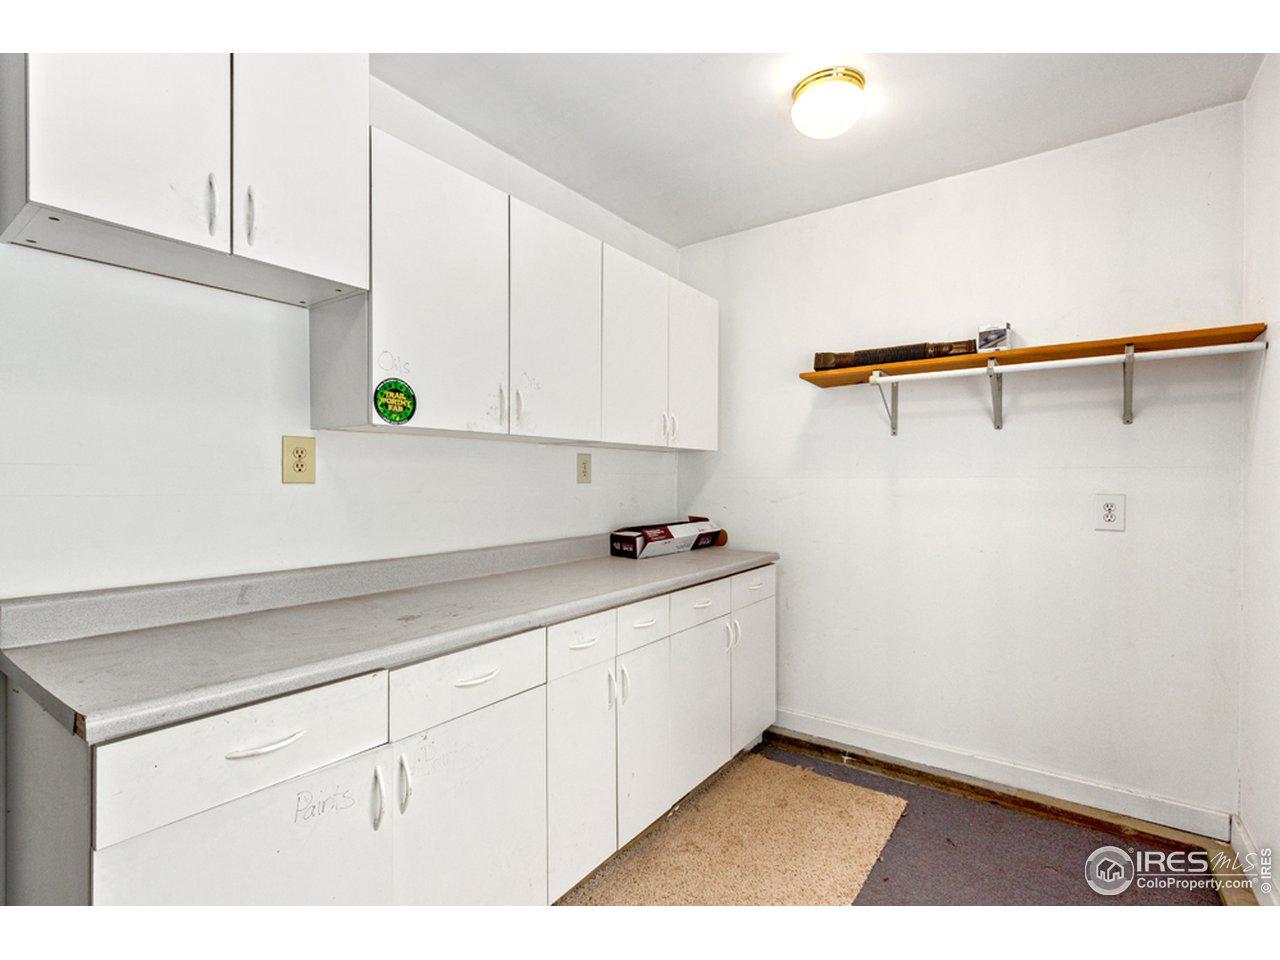 Expansive Deck - Enjoy the Colorado Lifestyle!